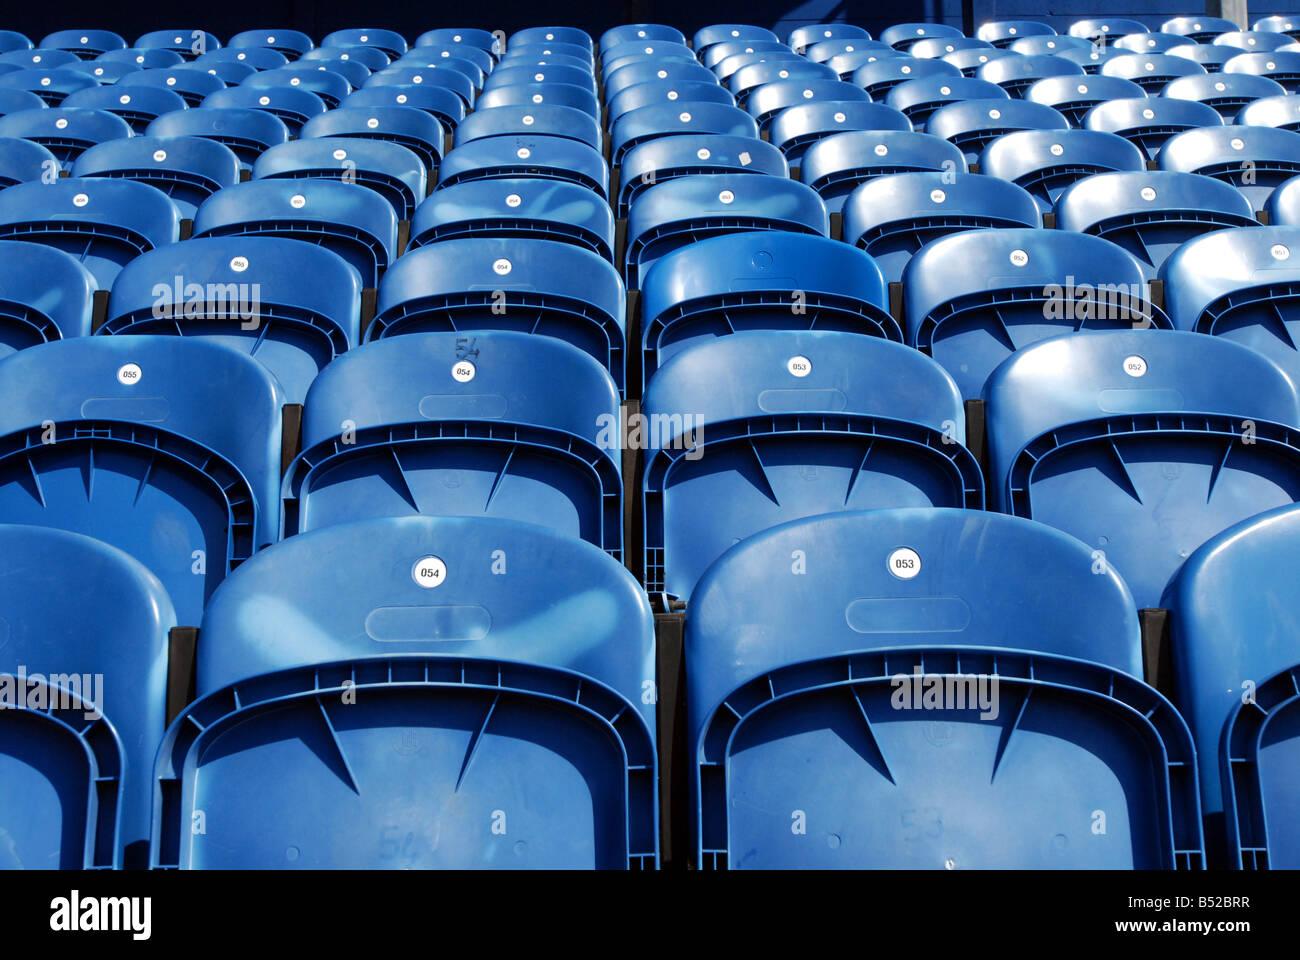 Blue Seating - Stock Image